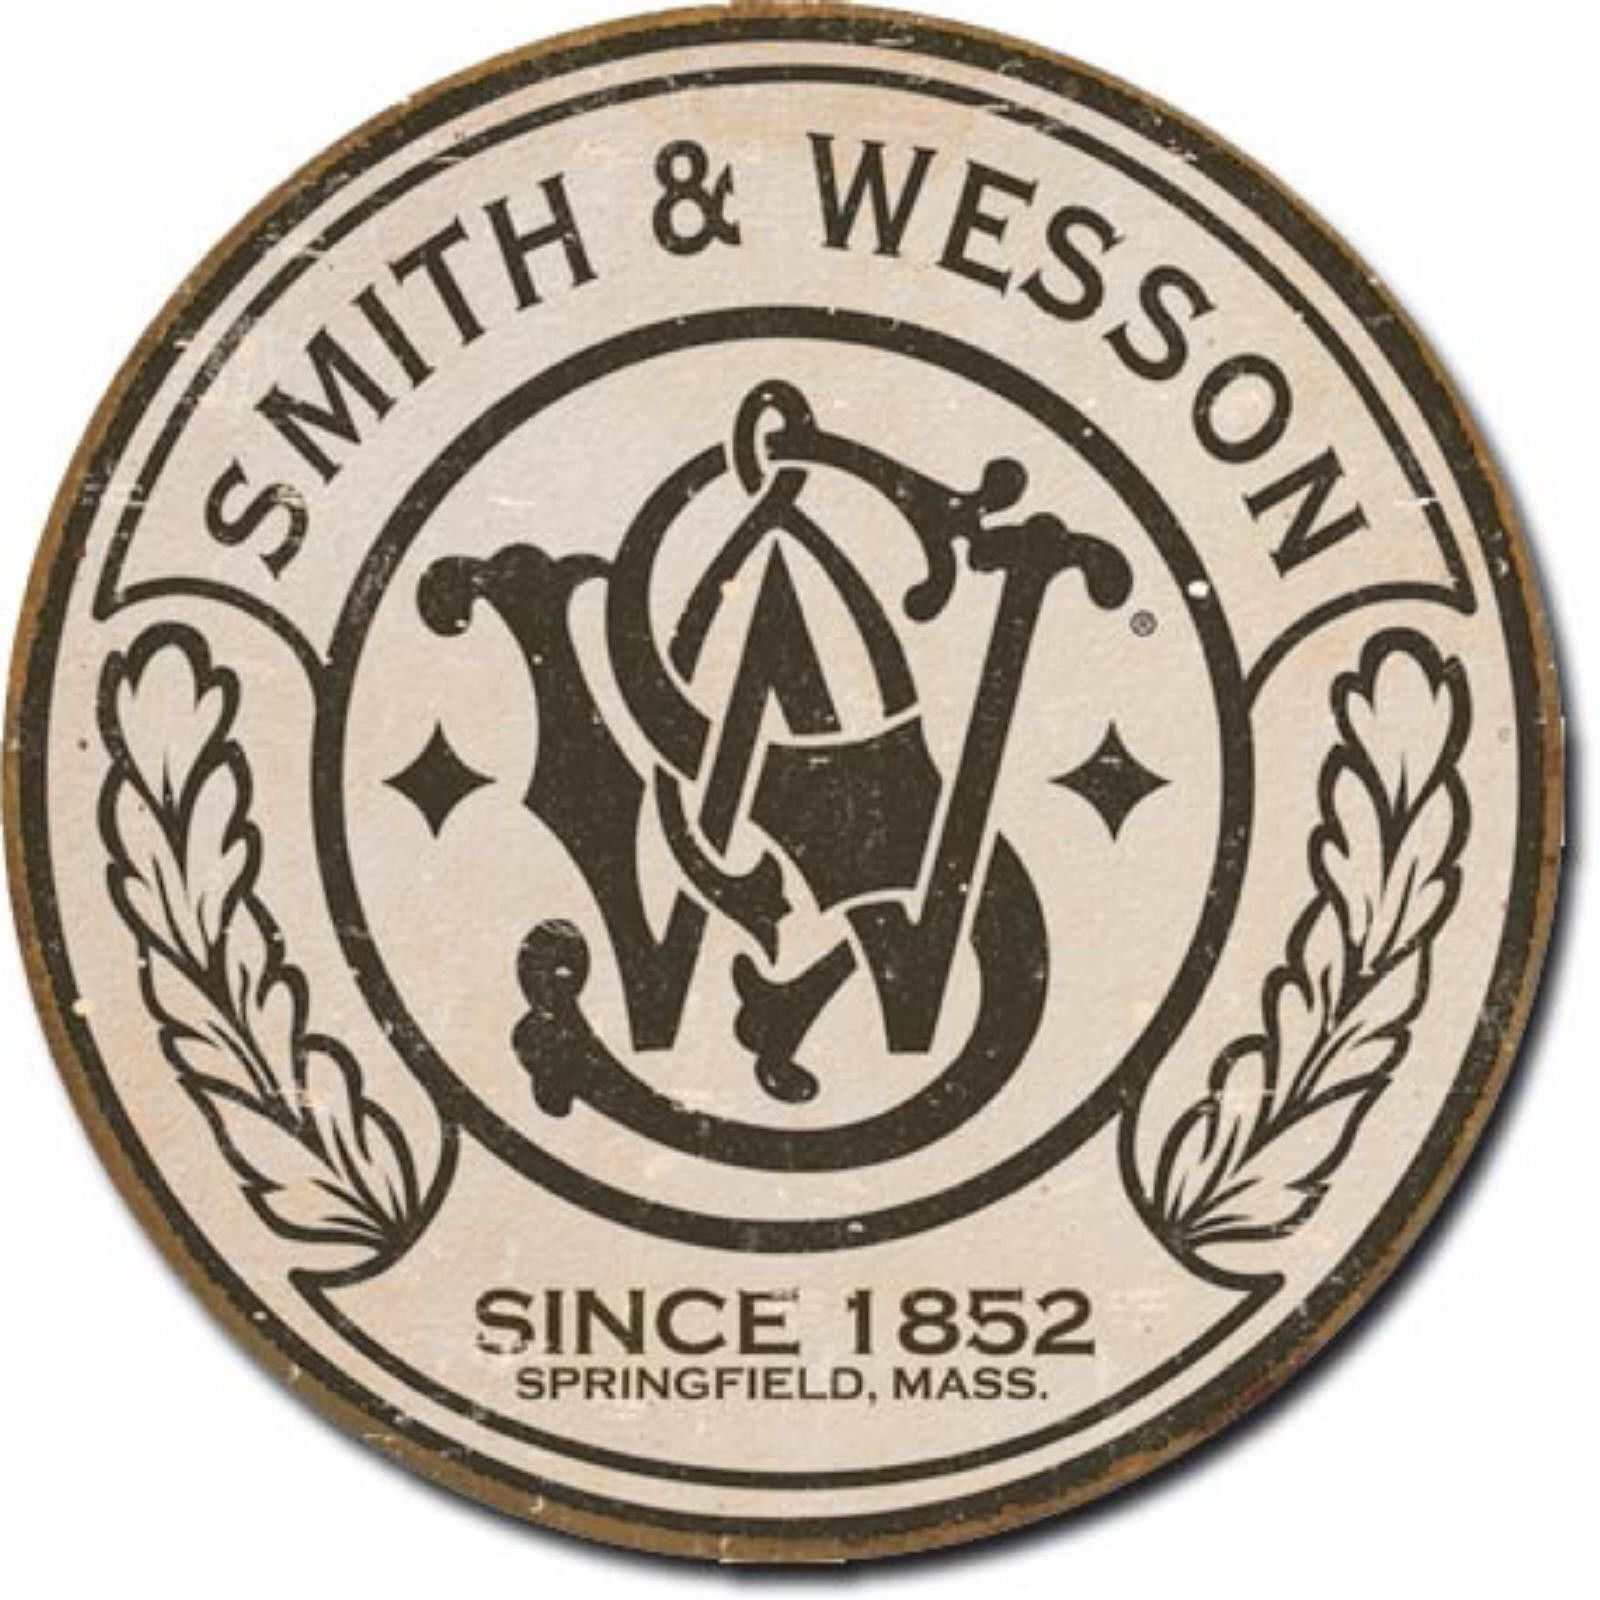 Vintage Replica Tin Metal Sign Smith & Wesson 32 38 44 Pistol ...